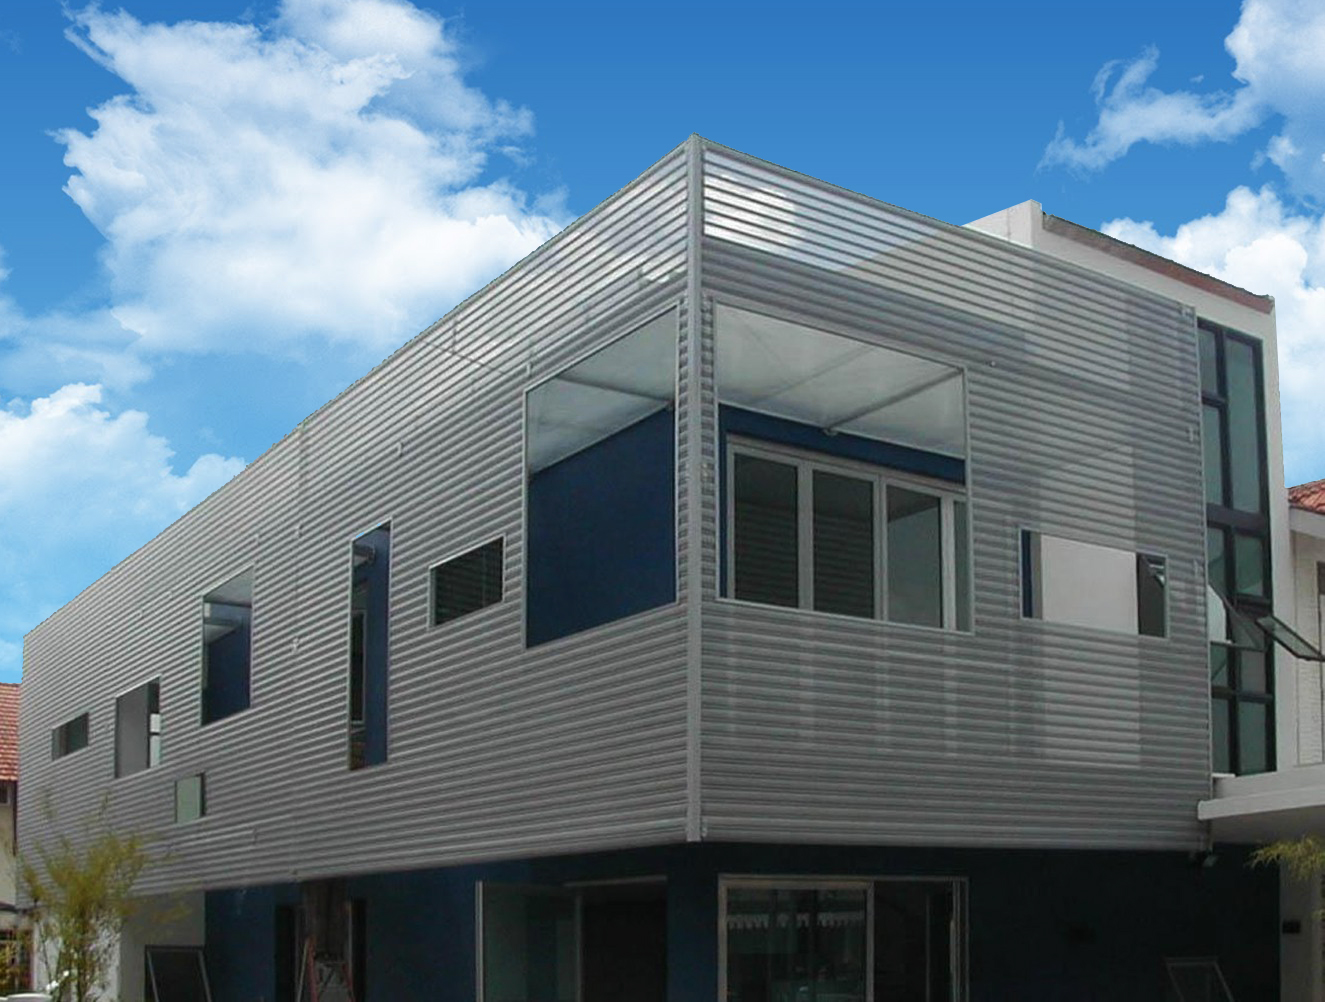 terrace house idea singapore